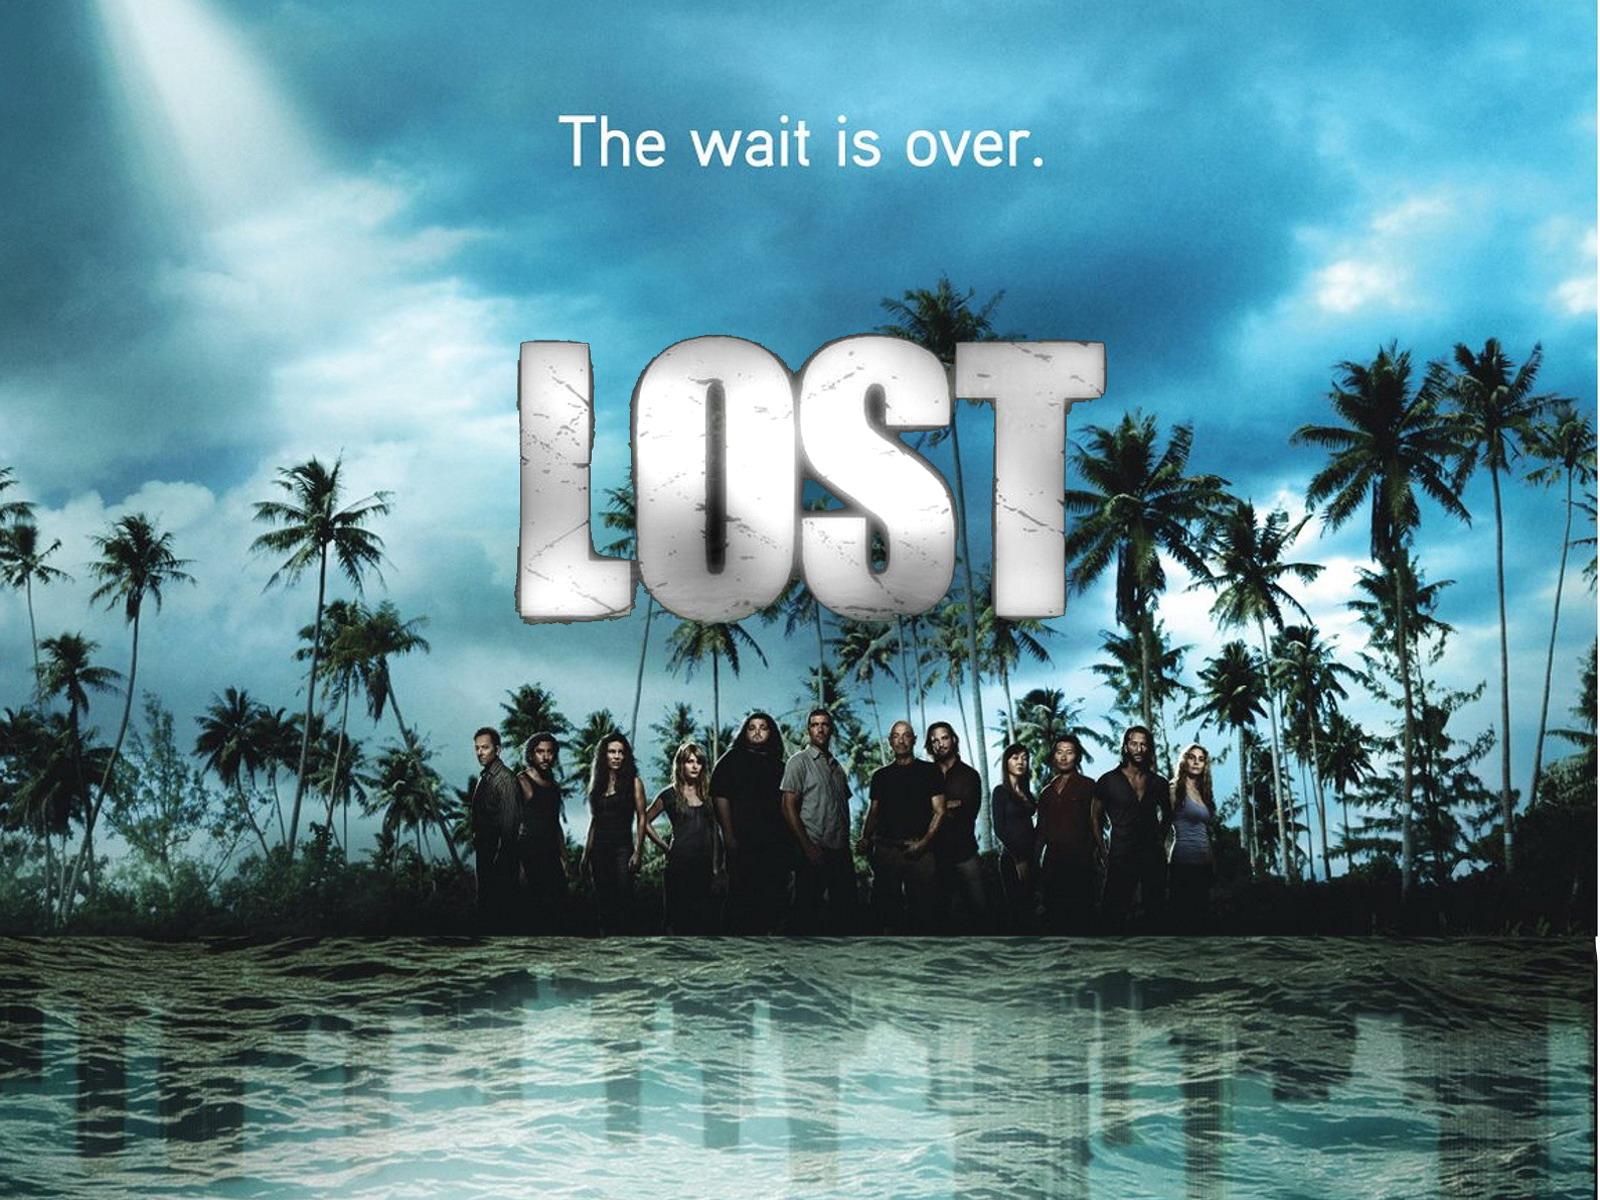 lost season 3 episode 7 download: